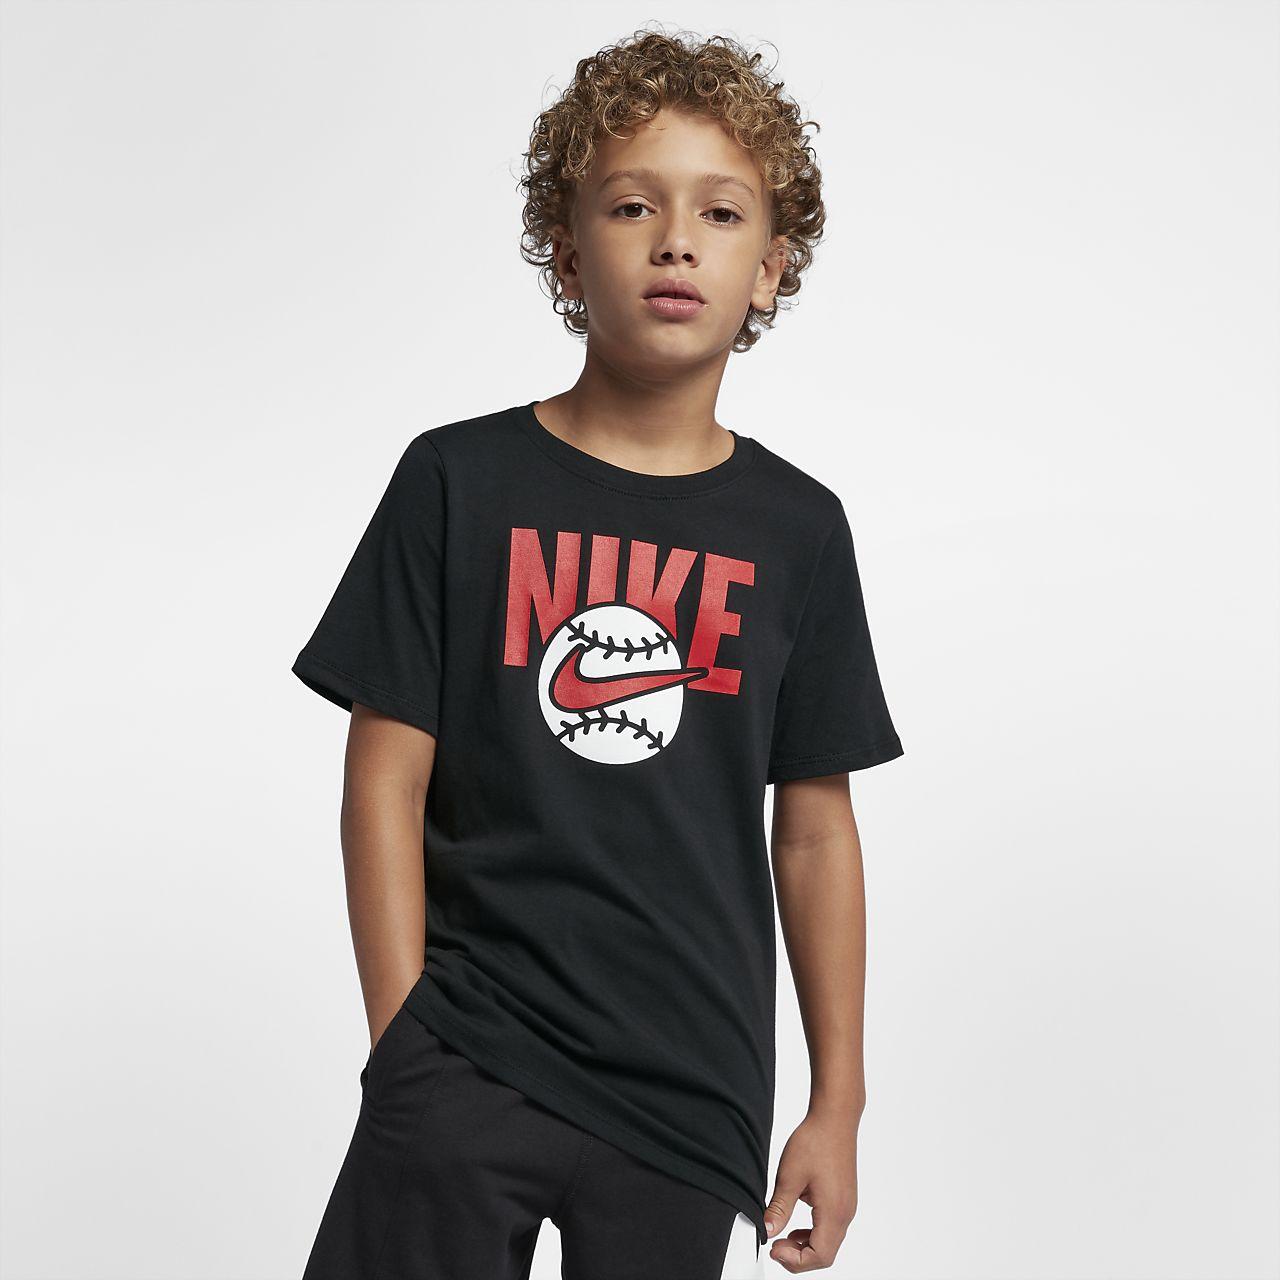 67c305dfb7e Nike Sportswear Big Kids  (Boys ) T-Shirt. Nike.com